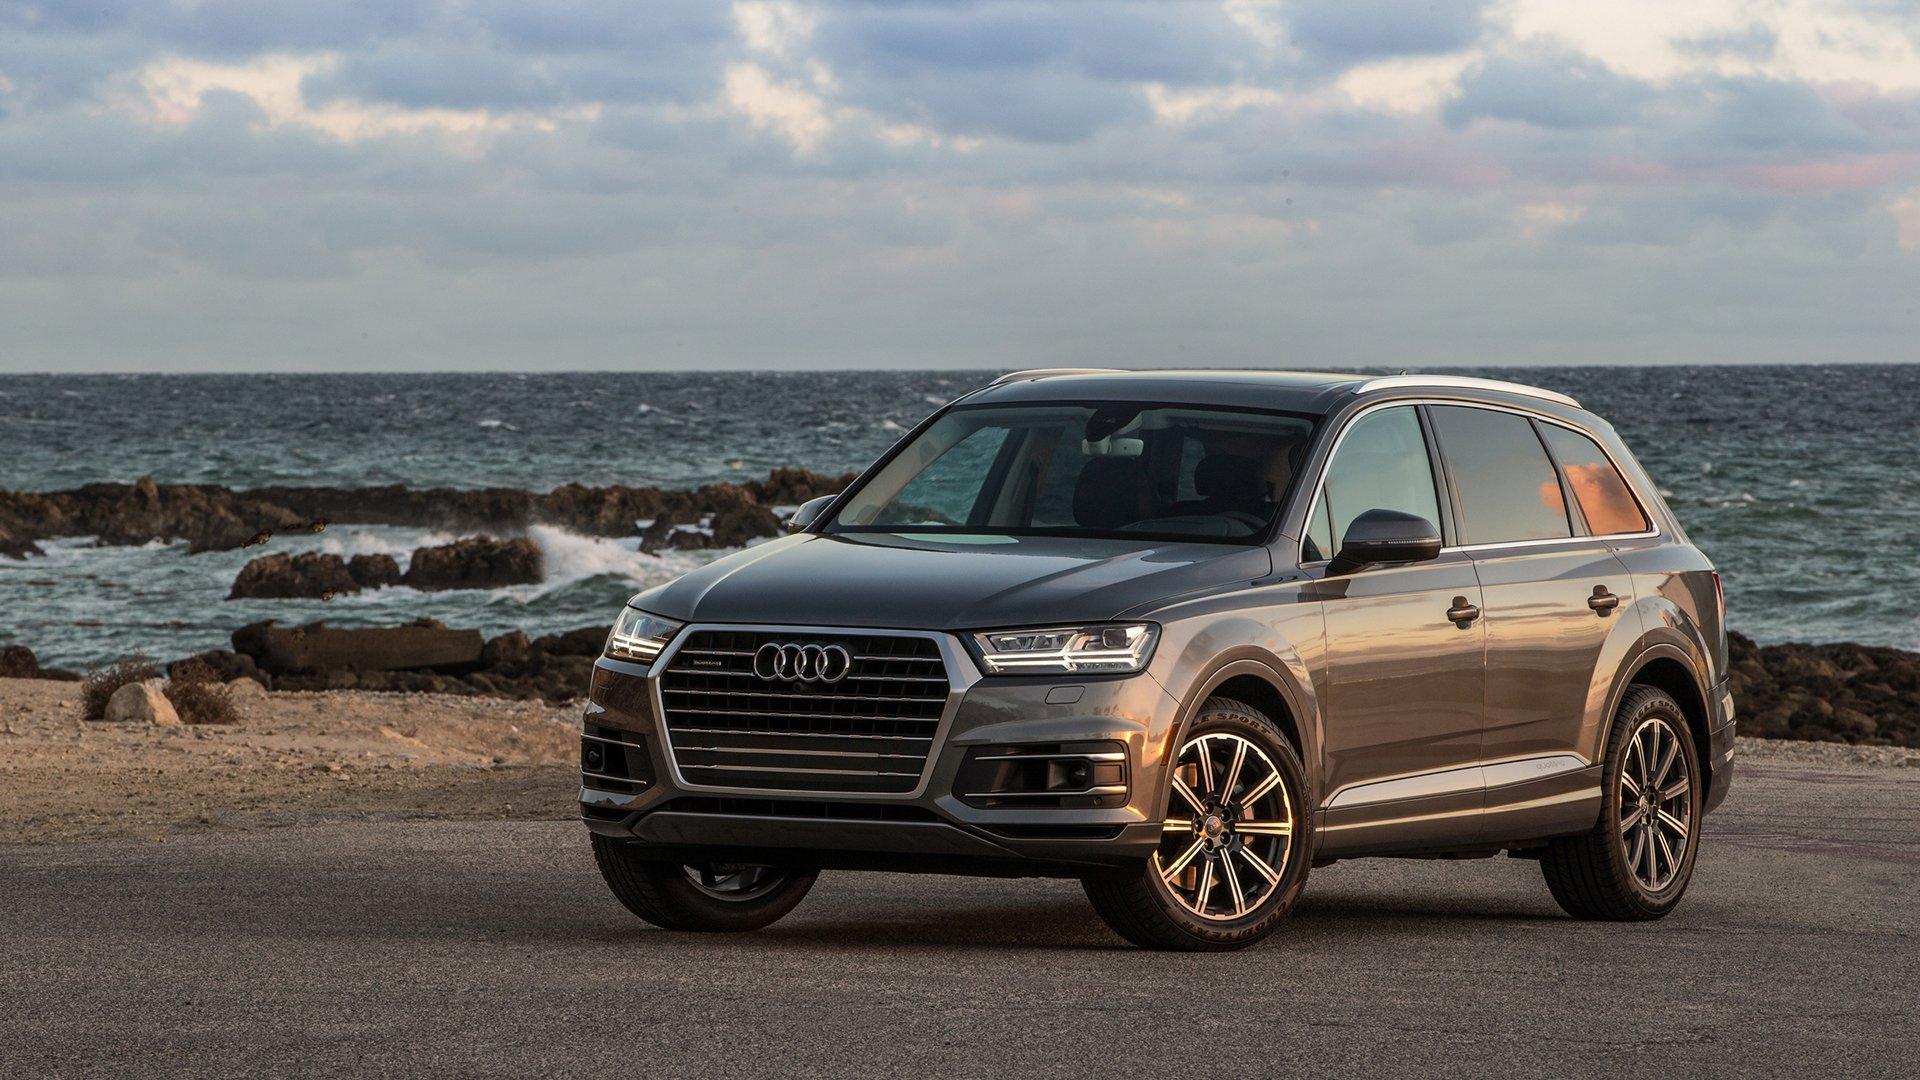 2017 Audi Q7 © Volkswagen AG